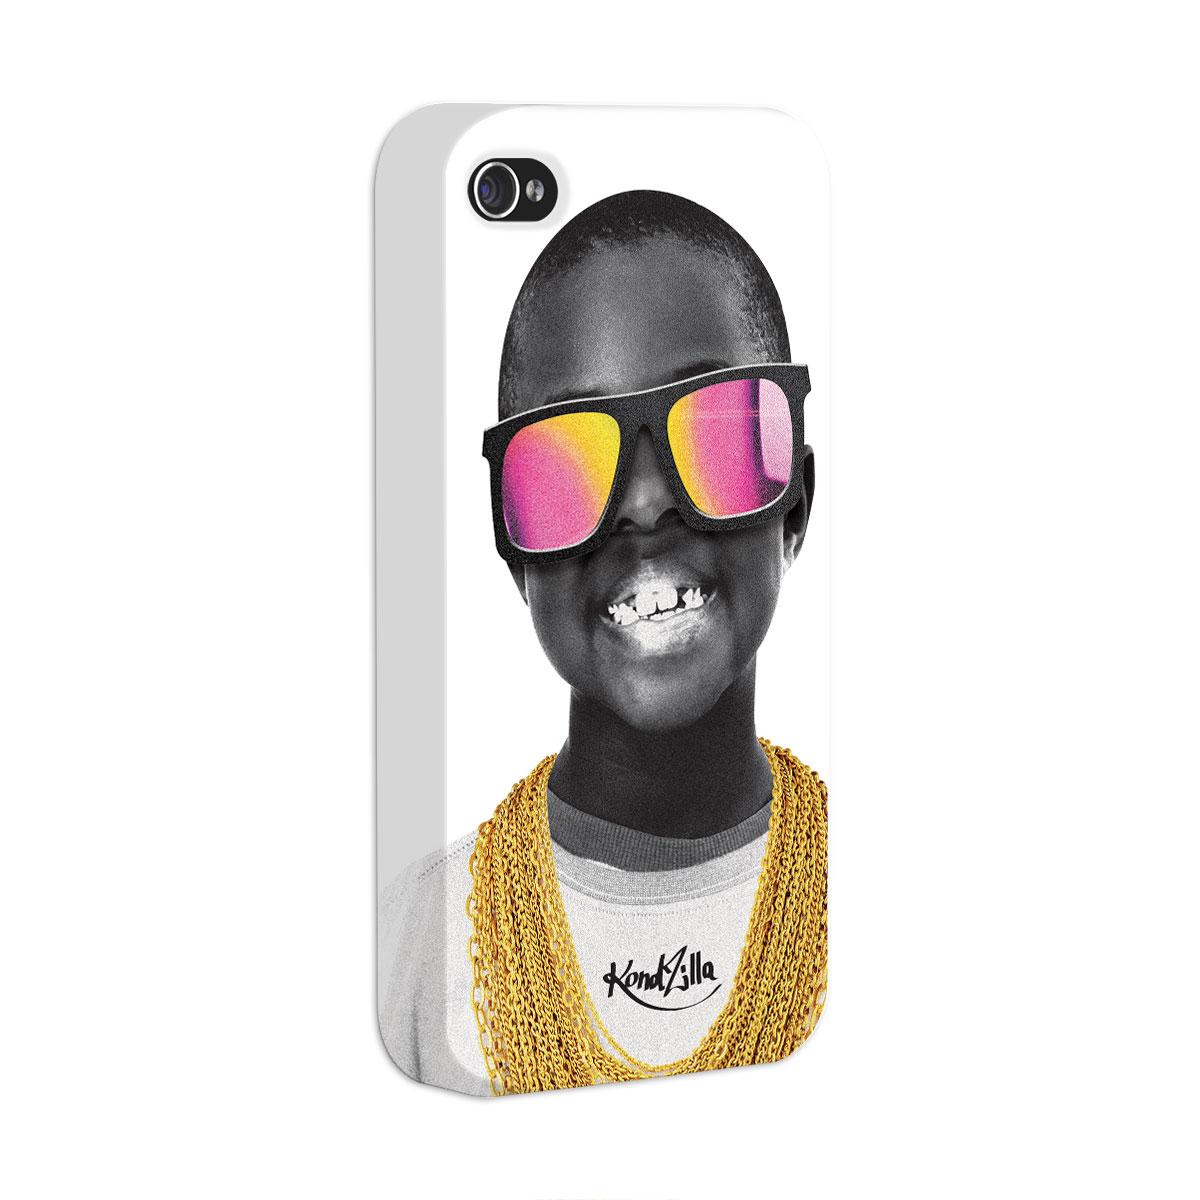 Capa para iPhone 4/4S Kondzilla Boy